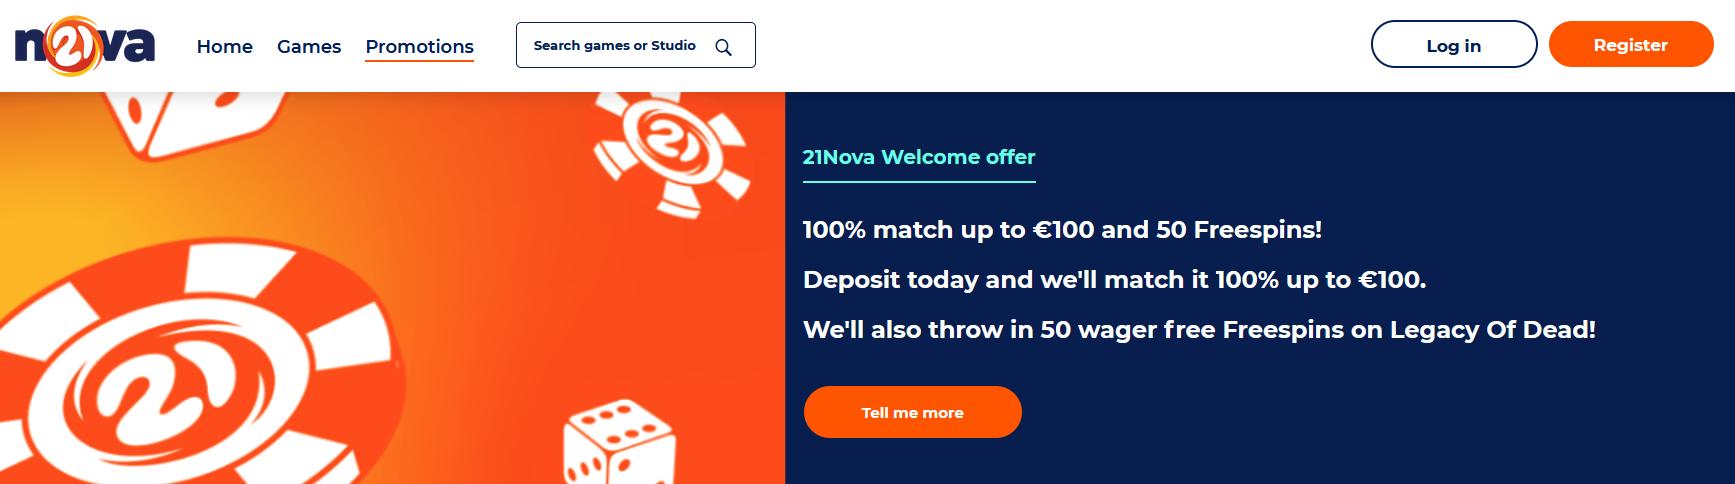 21nova Freespins